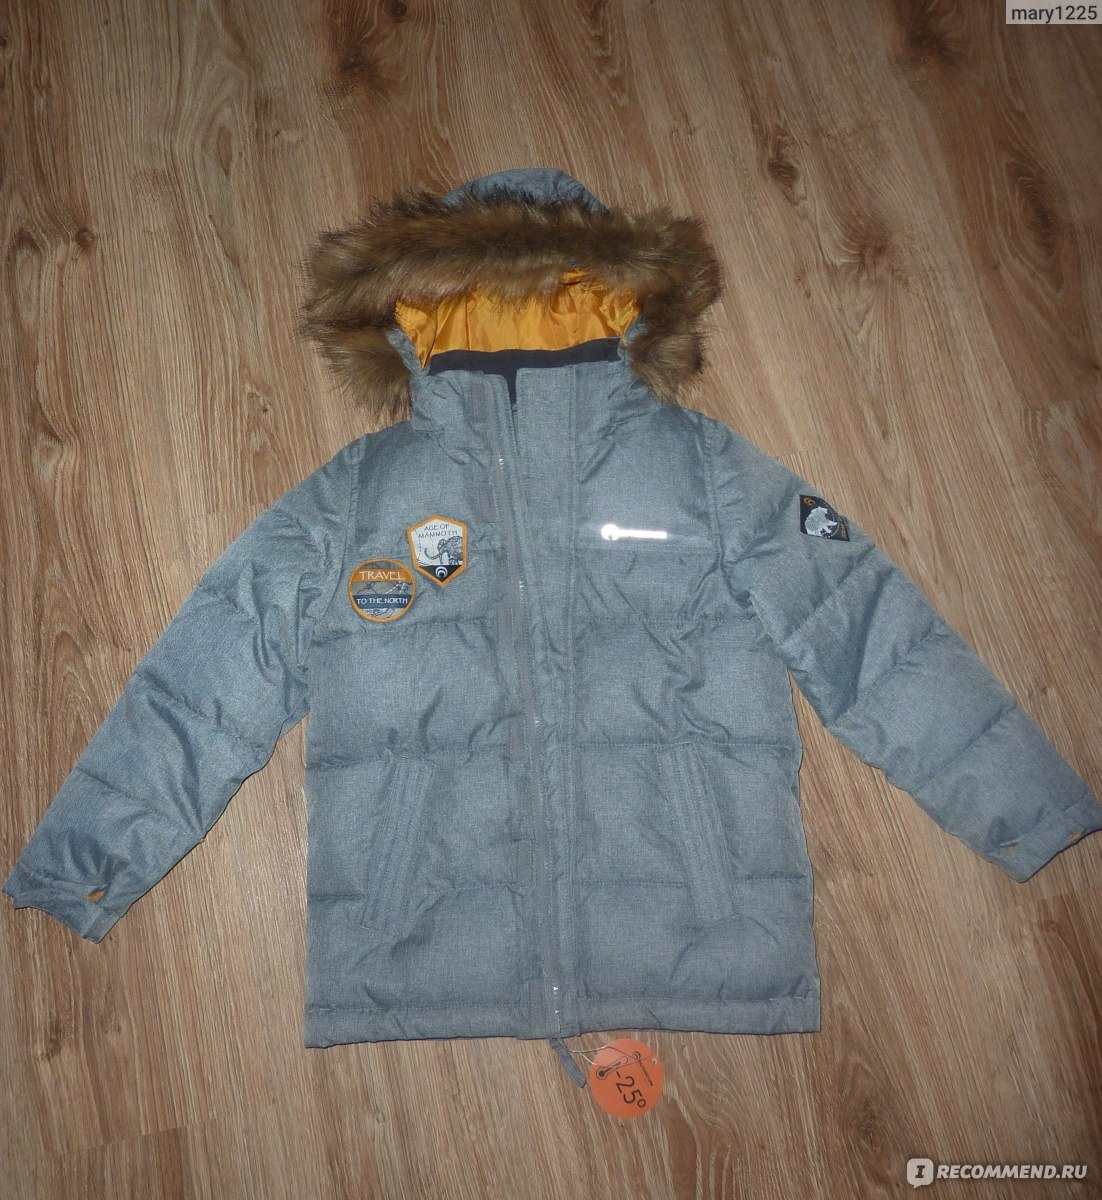 24b17e3fadaa6 Зимняя куртка Outventure UJAB182A12 - «Тёплая, лёгкая и стильная ...